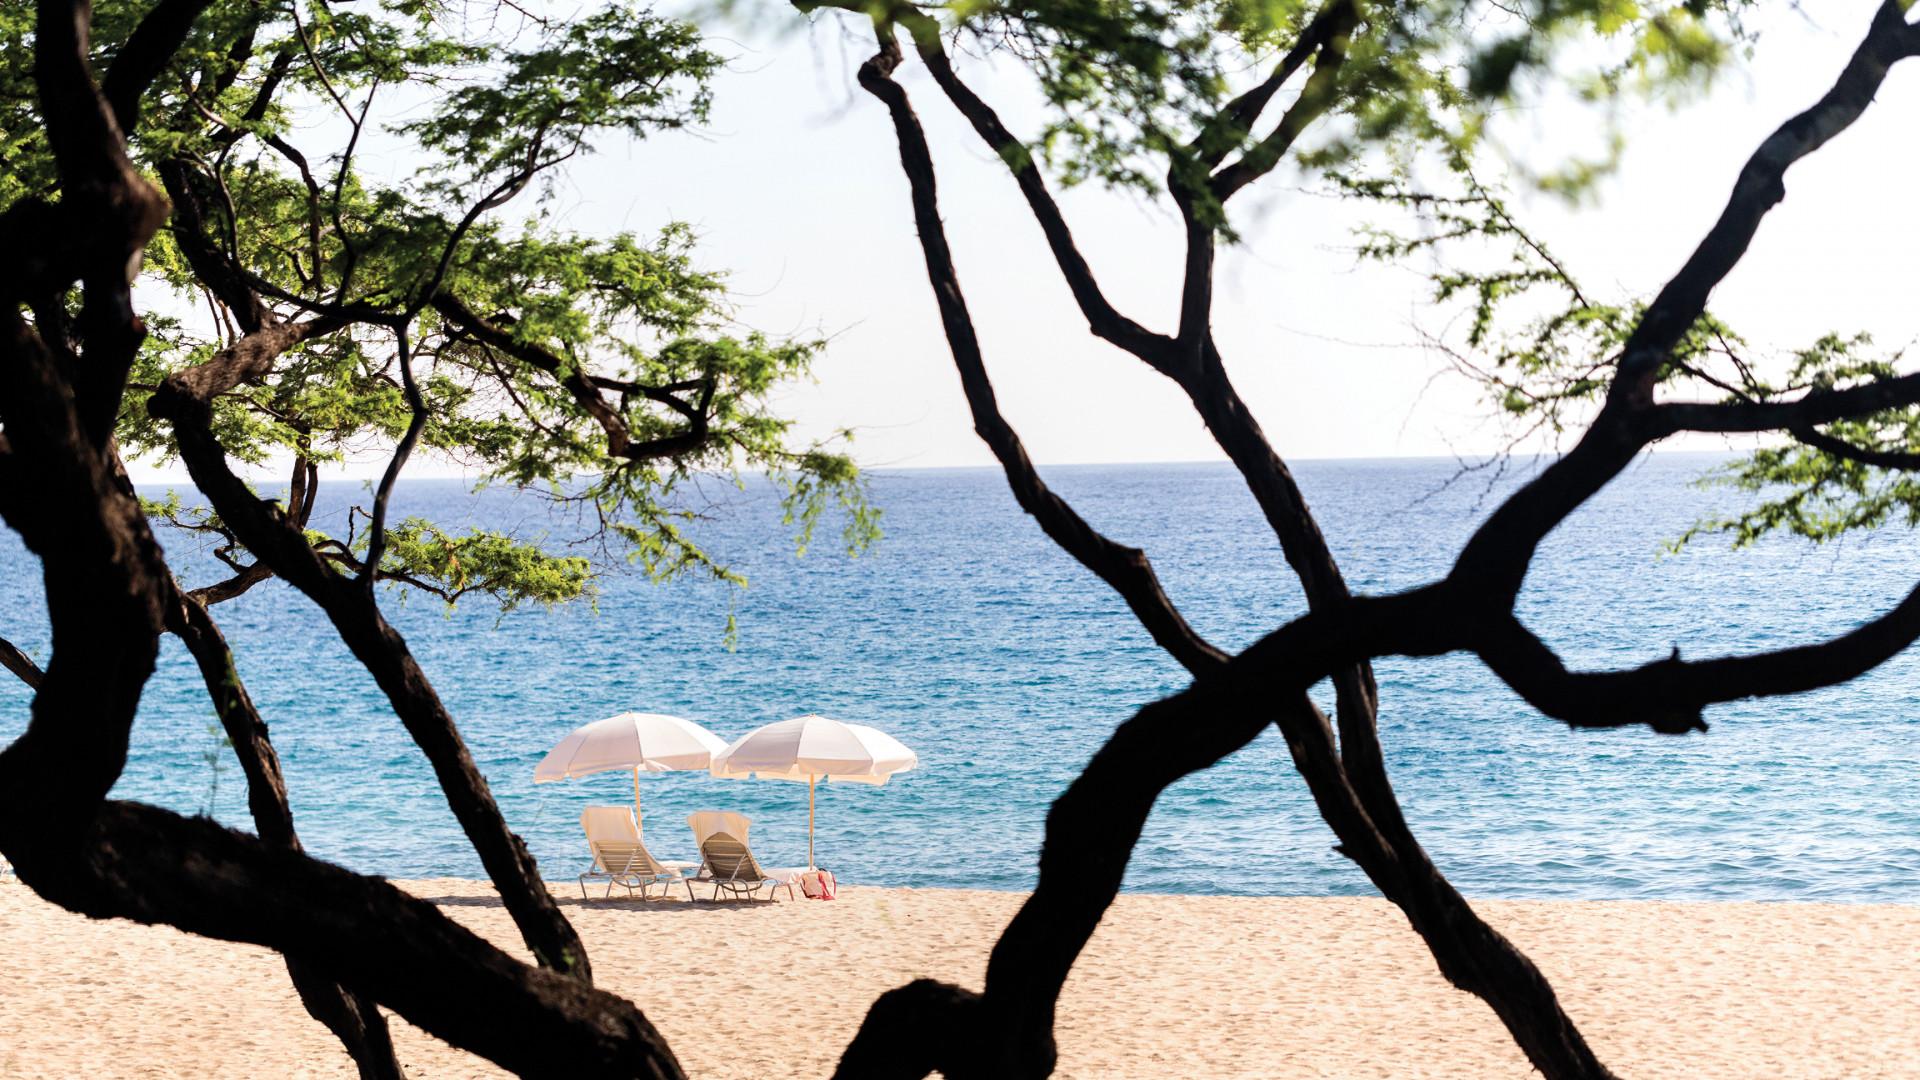 Sun loungers on Lanai, Hawaii